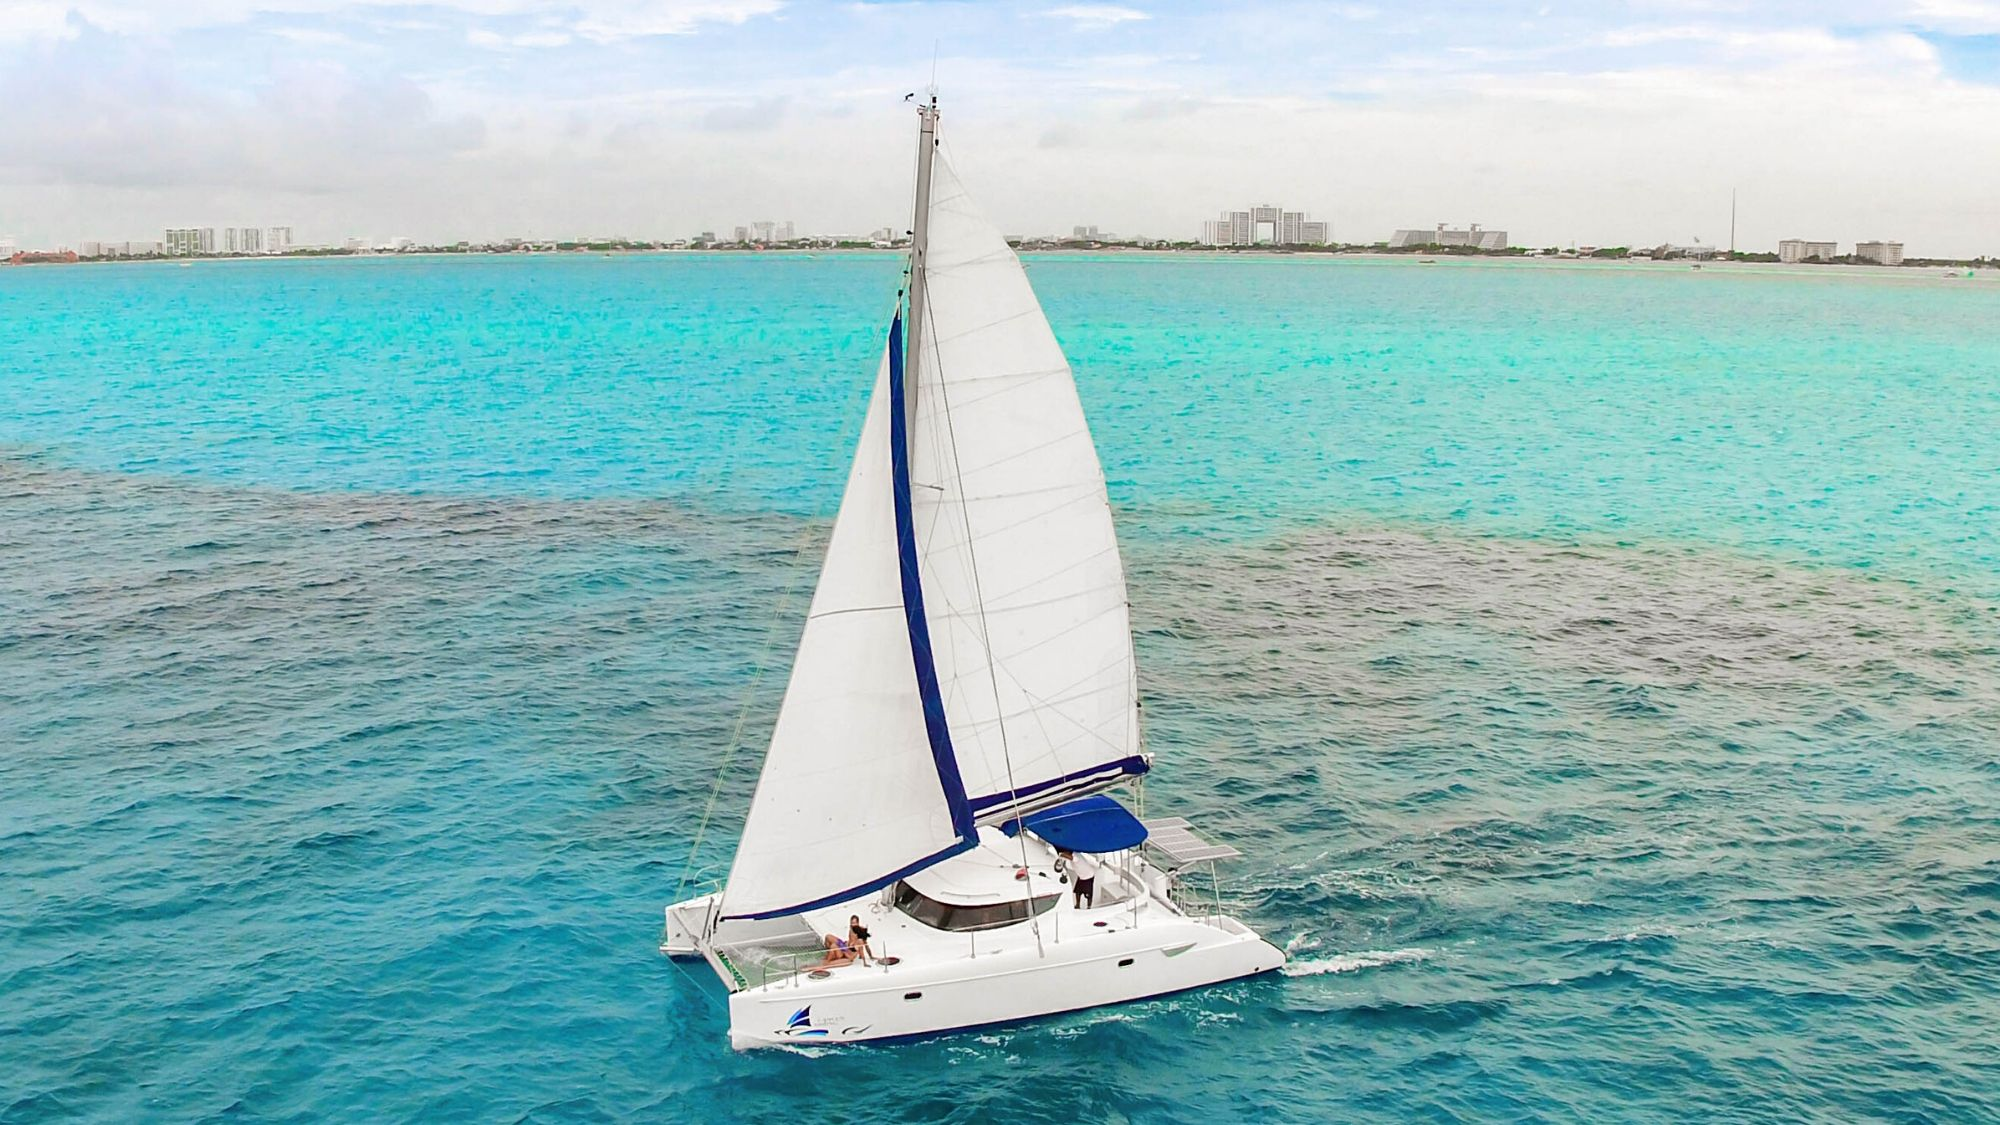 Malube - Isla Mujeres Catamaran Tour - Cancun Sailing - 2000px